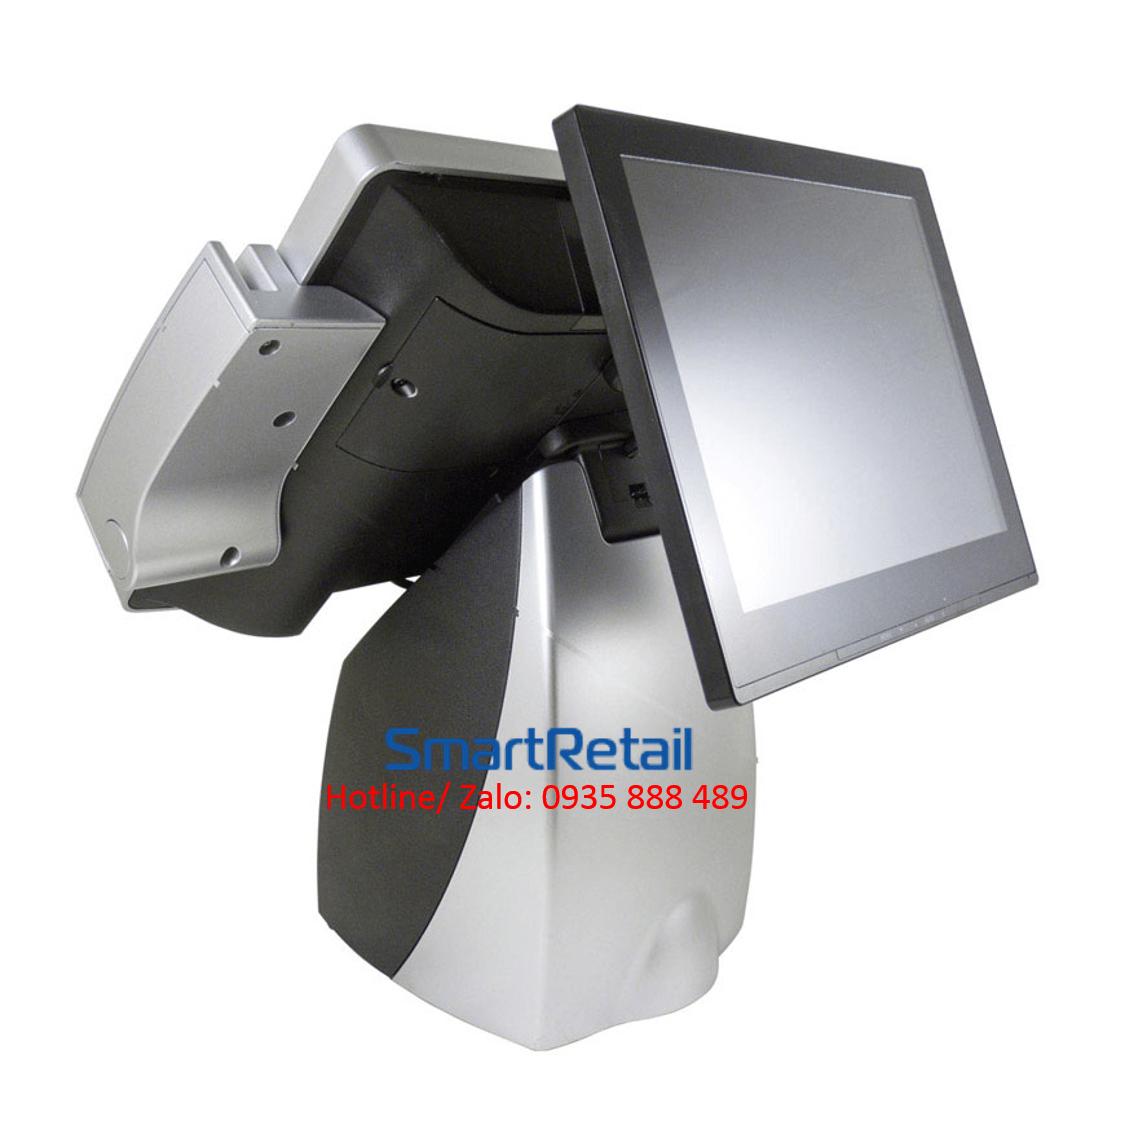 SmartRetail máy tính tiền TYSSO 650B 4